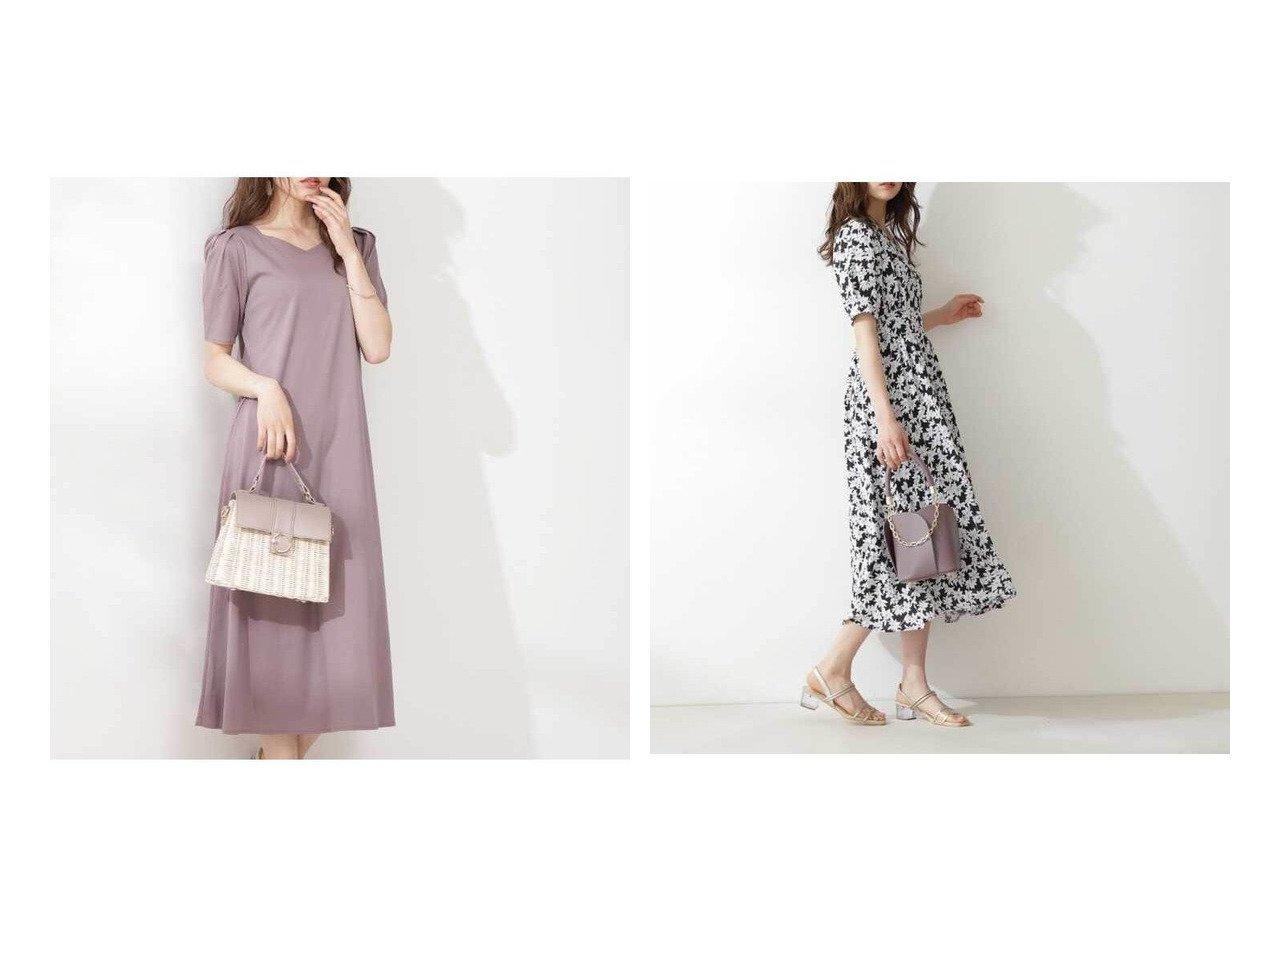 【PROPORTION BODY DRESSING/プロポーション ボディドレッシング】のバックボタンカットワンピース&フラワーマキシワンピース 【ワンピース・ドレス】おすすめ!人気、トレンド・レディースファッションの通販 おすすめで人気の流行・トレンド、ファッションの通販商品 インテリア・家具・メンズファッション・キッズファッション・レディースファッション・服の通販 founy(ファニー) https://founy.com/ ファッション Fashion レディースファッション WOMEN ワンピース Dress マキシワンピース Maxi Dress カットソー シェイプ リラックス シャーリング デコルテ フィット フラワー ロング |ID:crp329100000044172